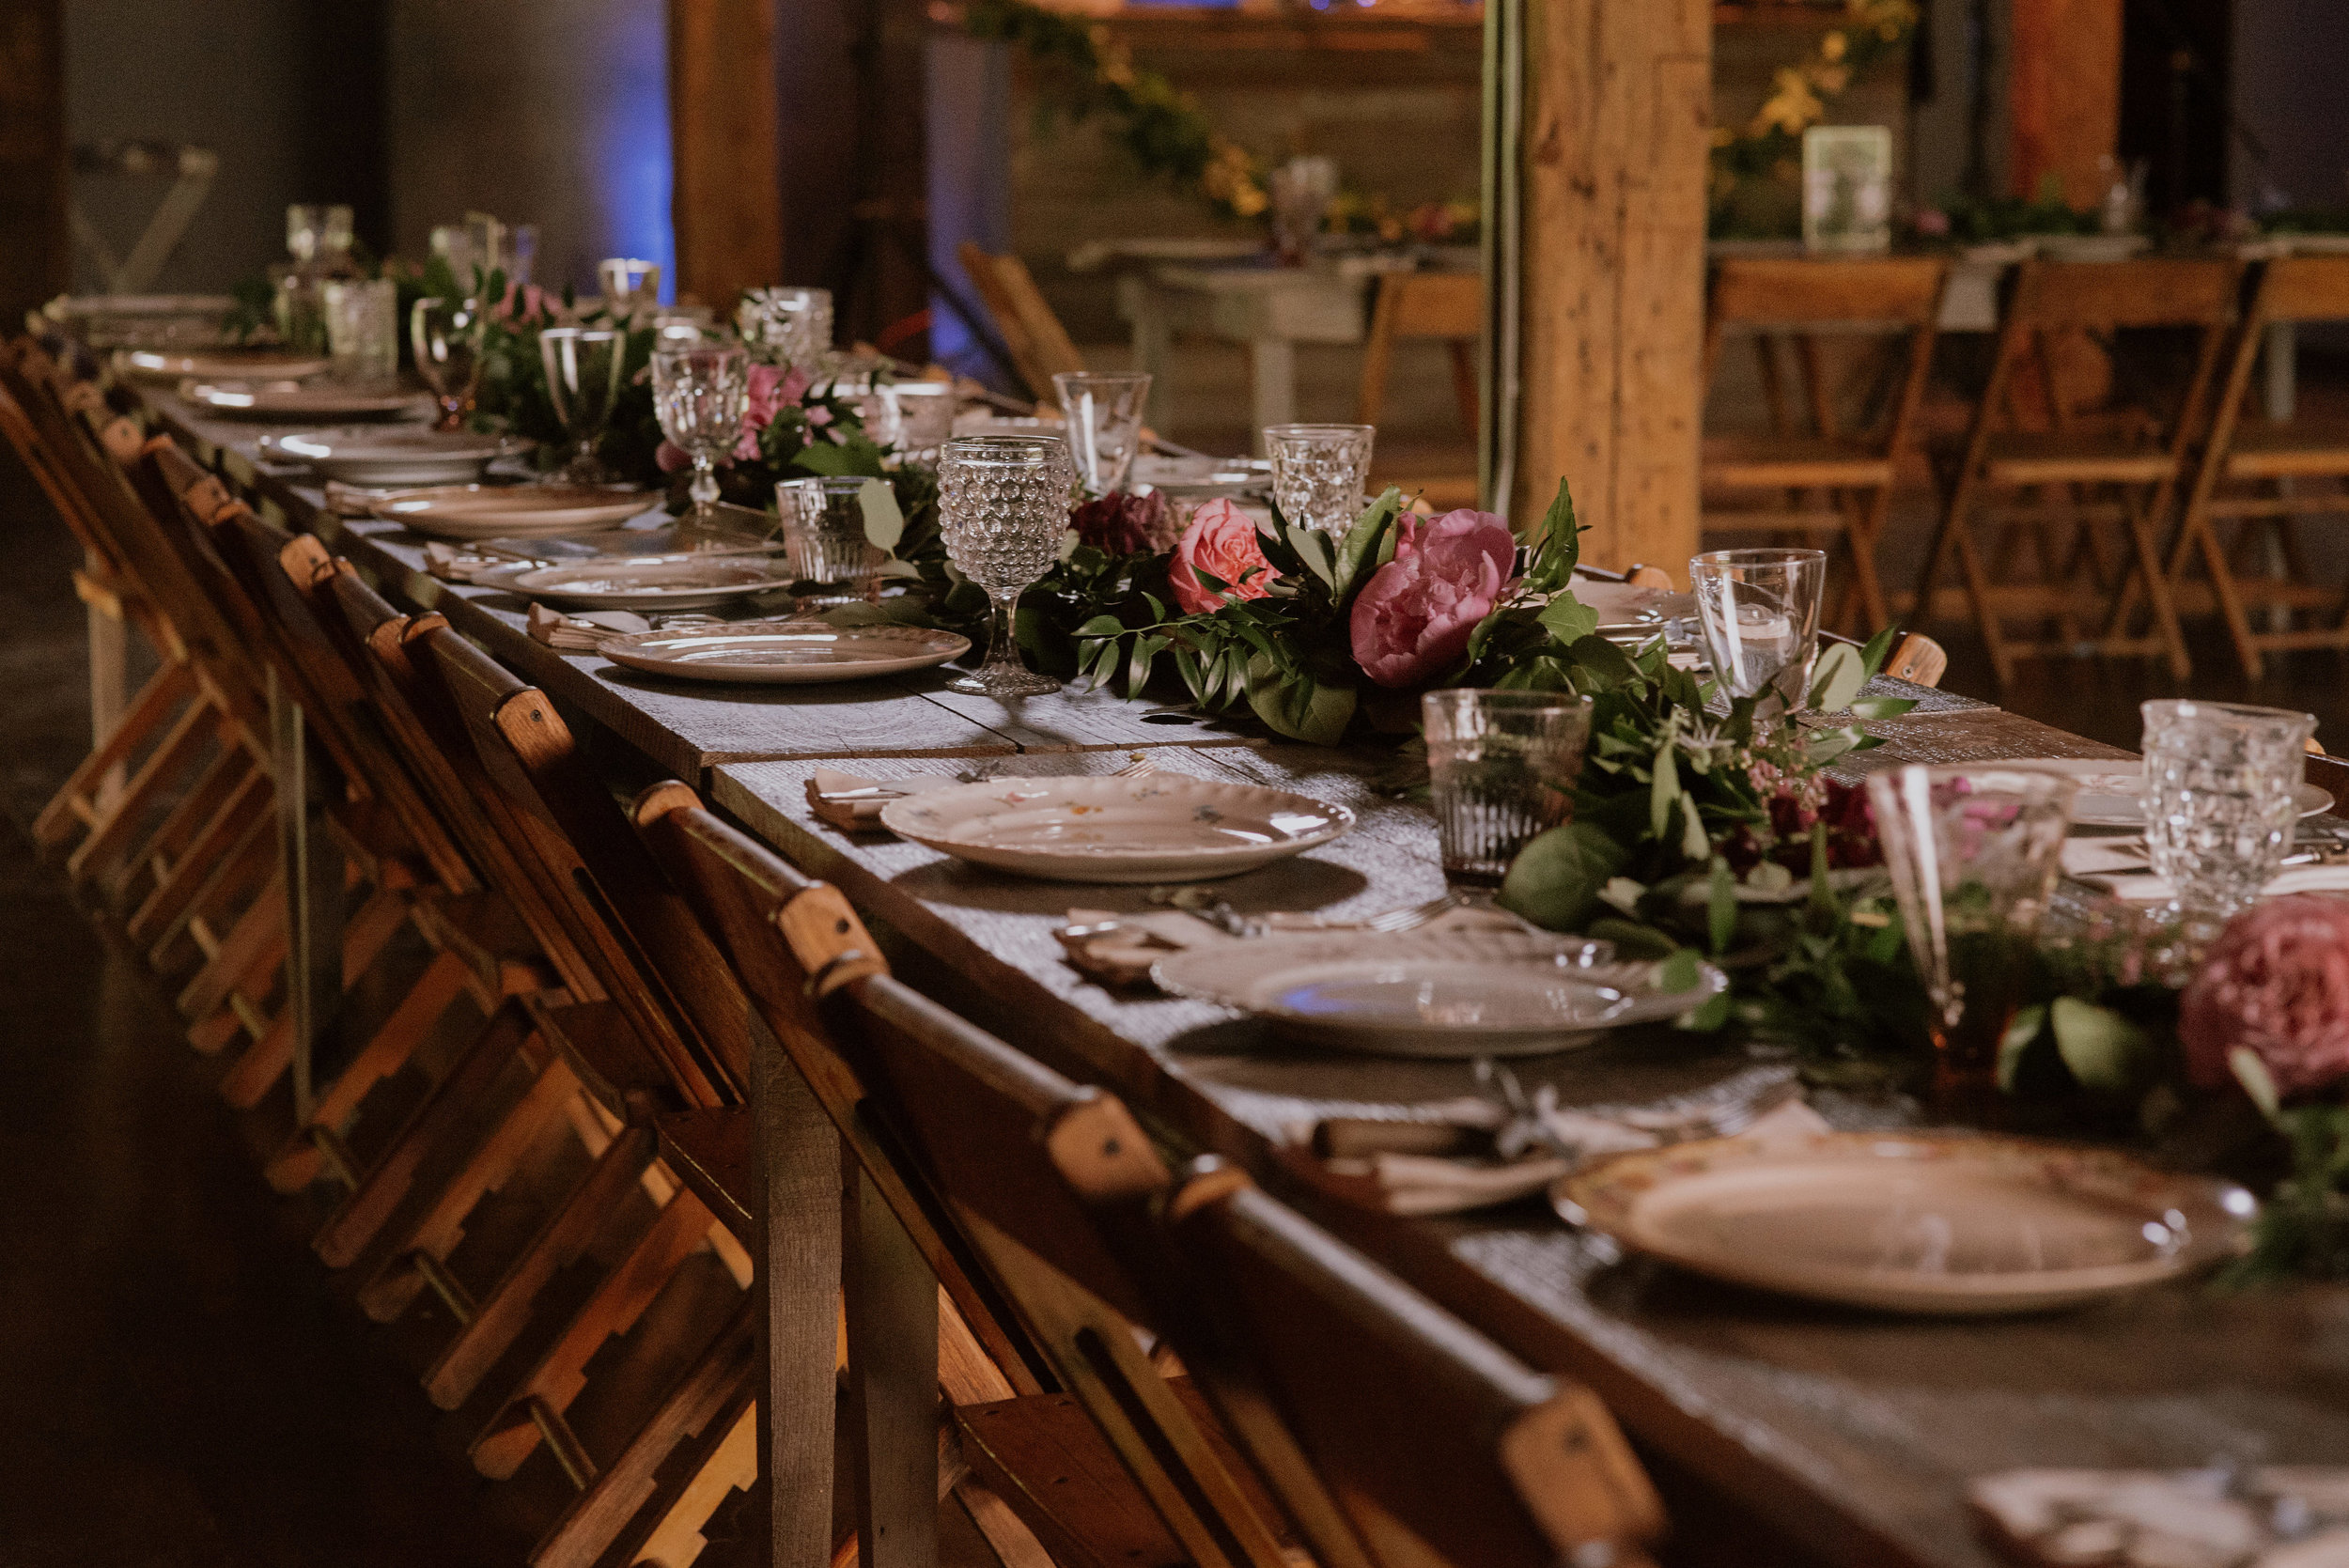 Cassandra-Anu-Wedding-Upstate-Catskills-Summer-Meadowlark-Stills-Lawrence-Braun-FINAL-0221.jpg